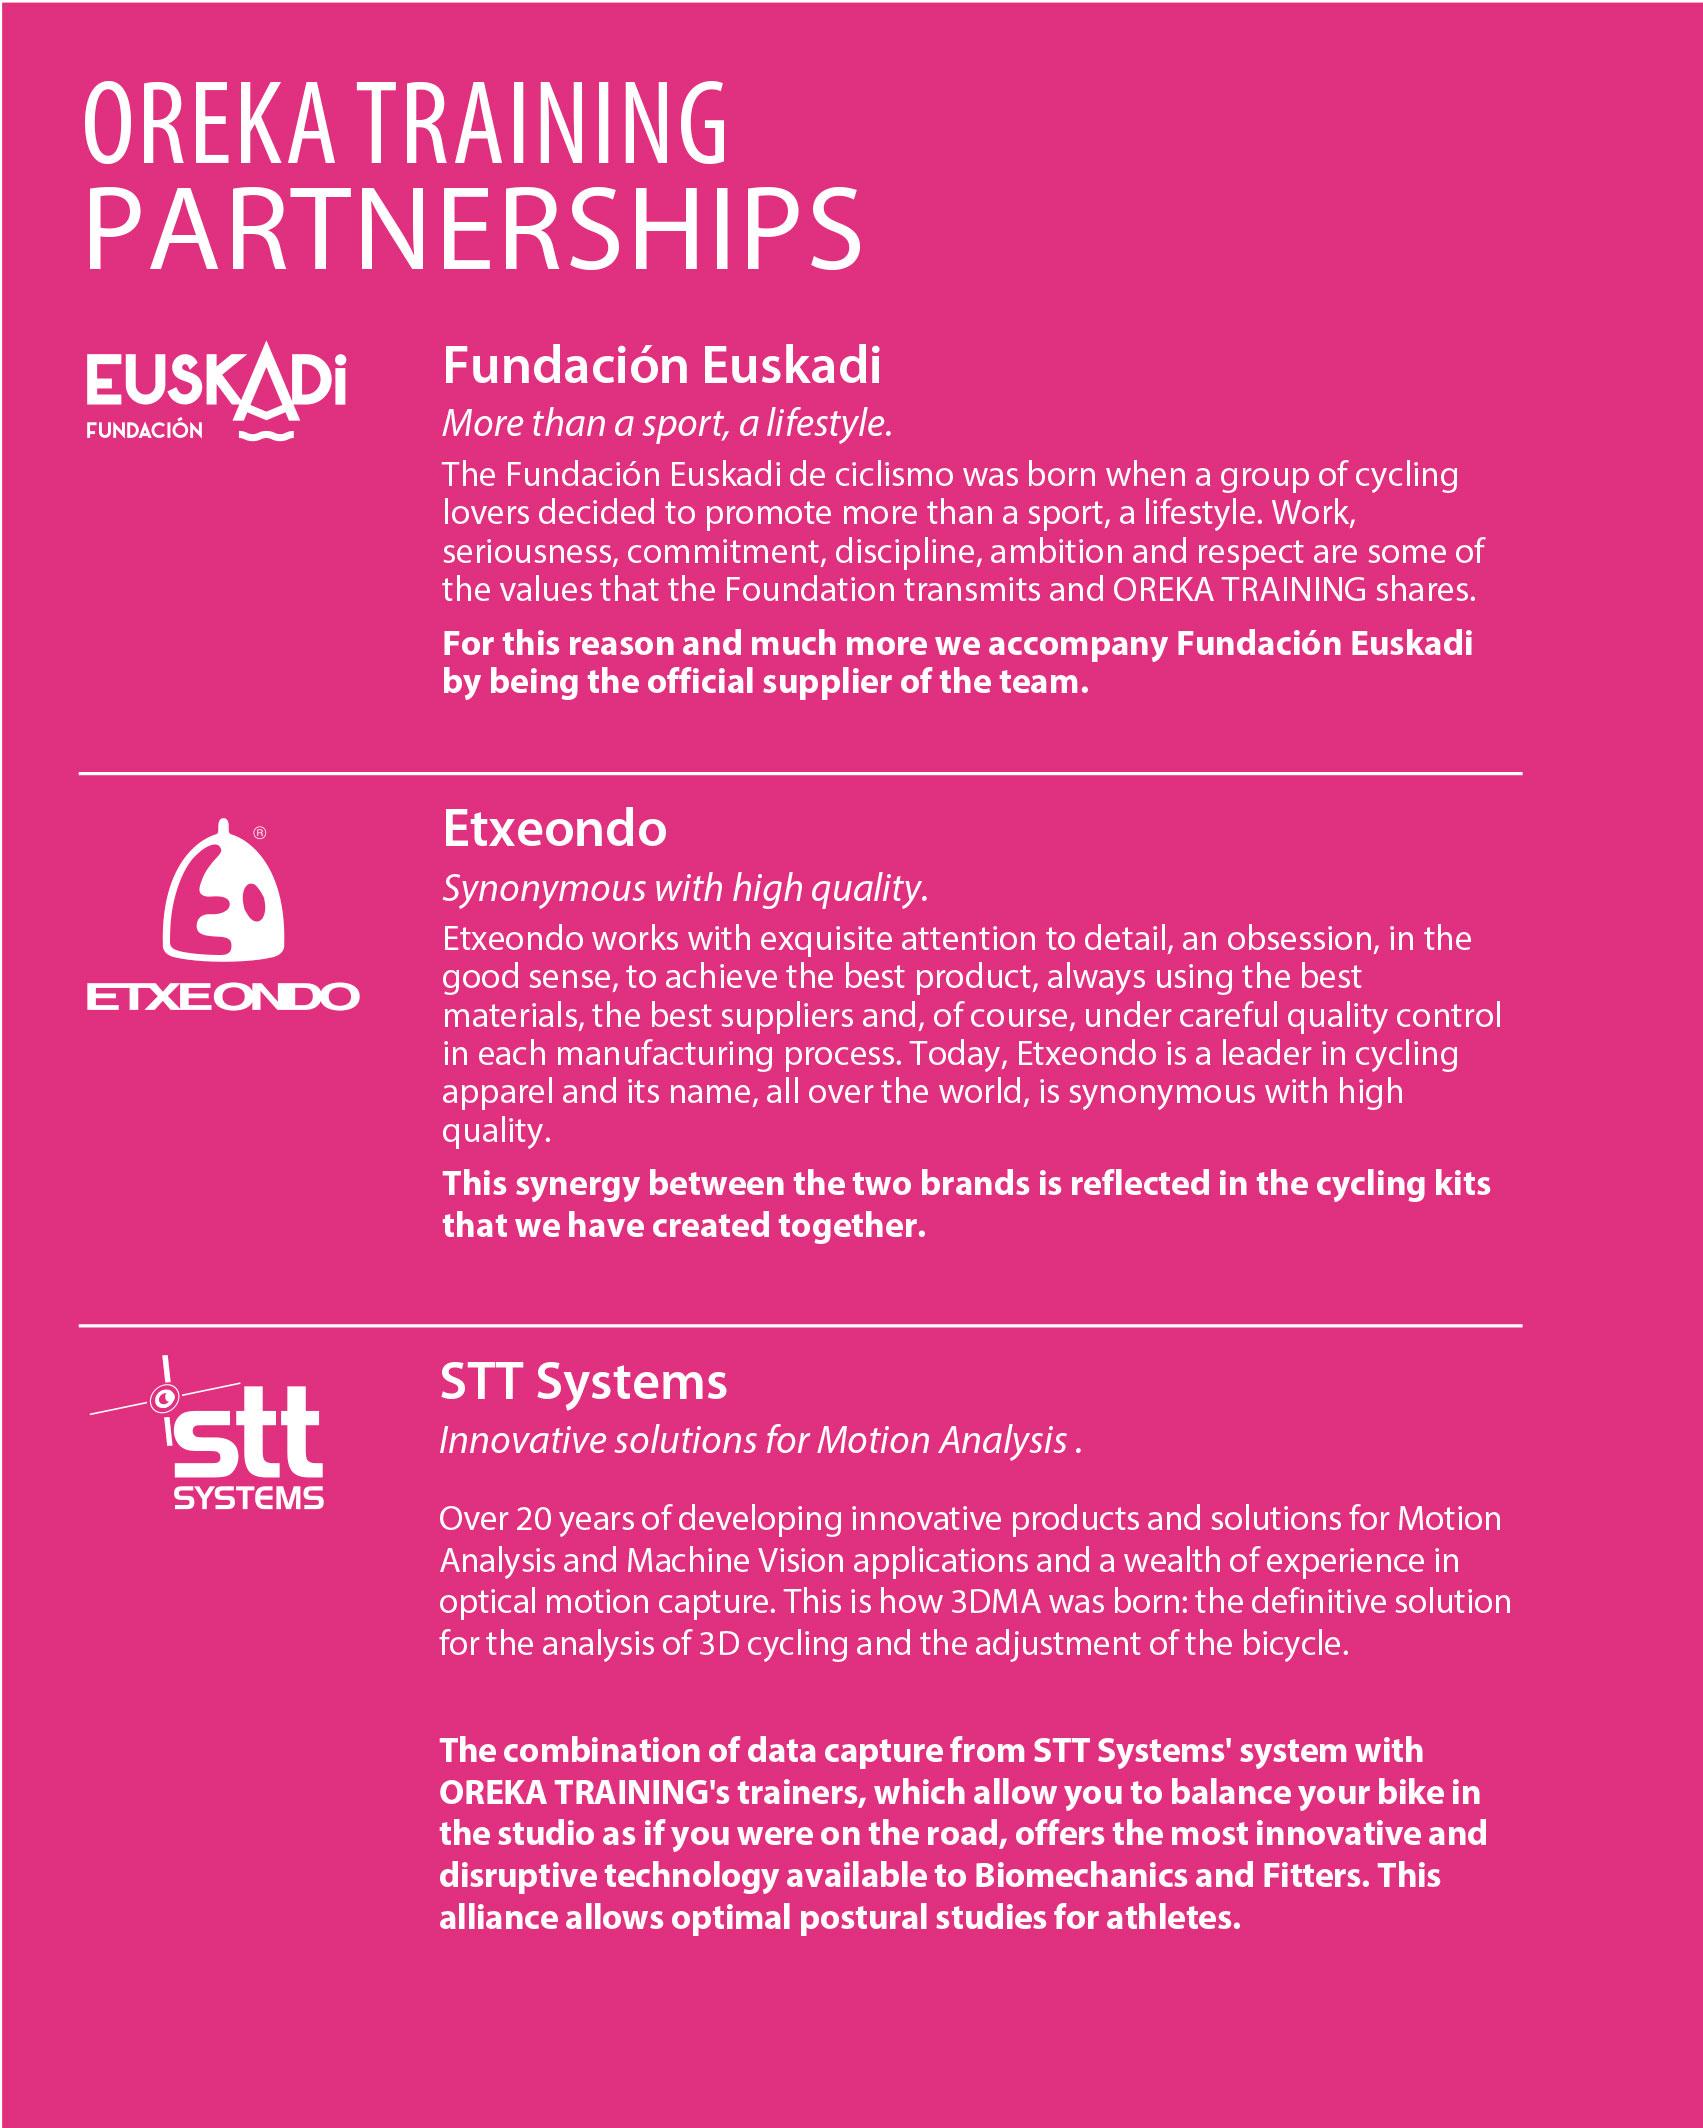 oreka partnerships about us